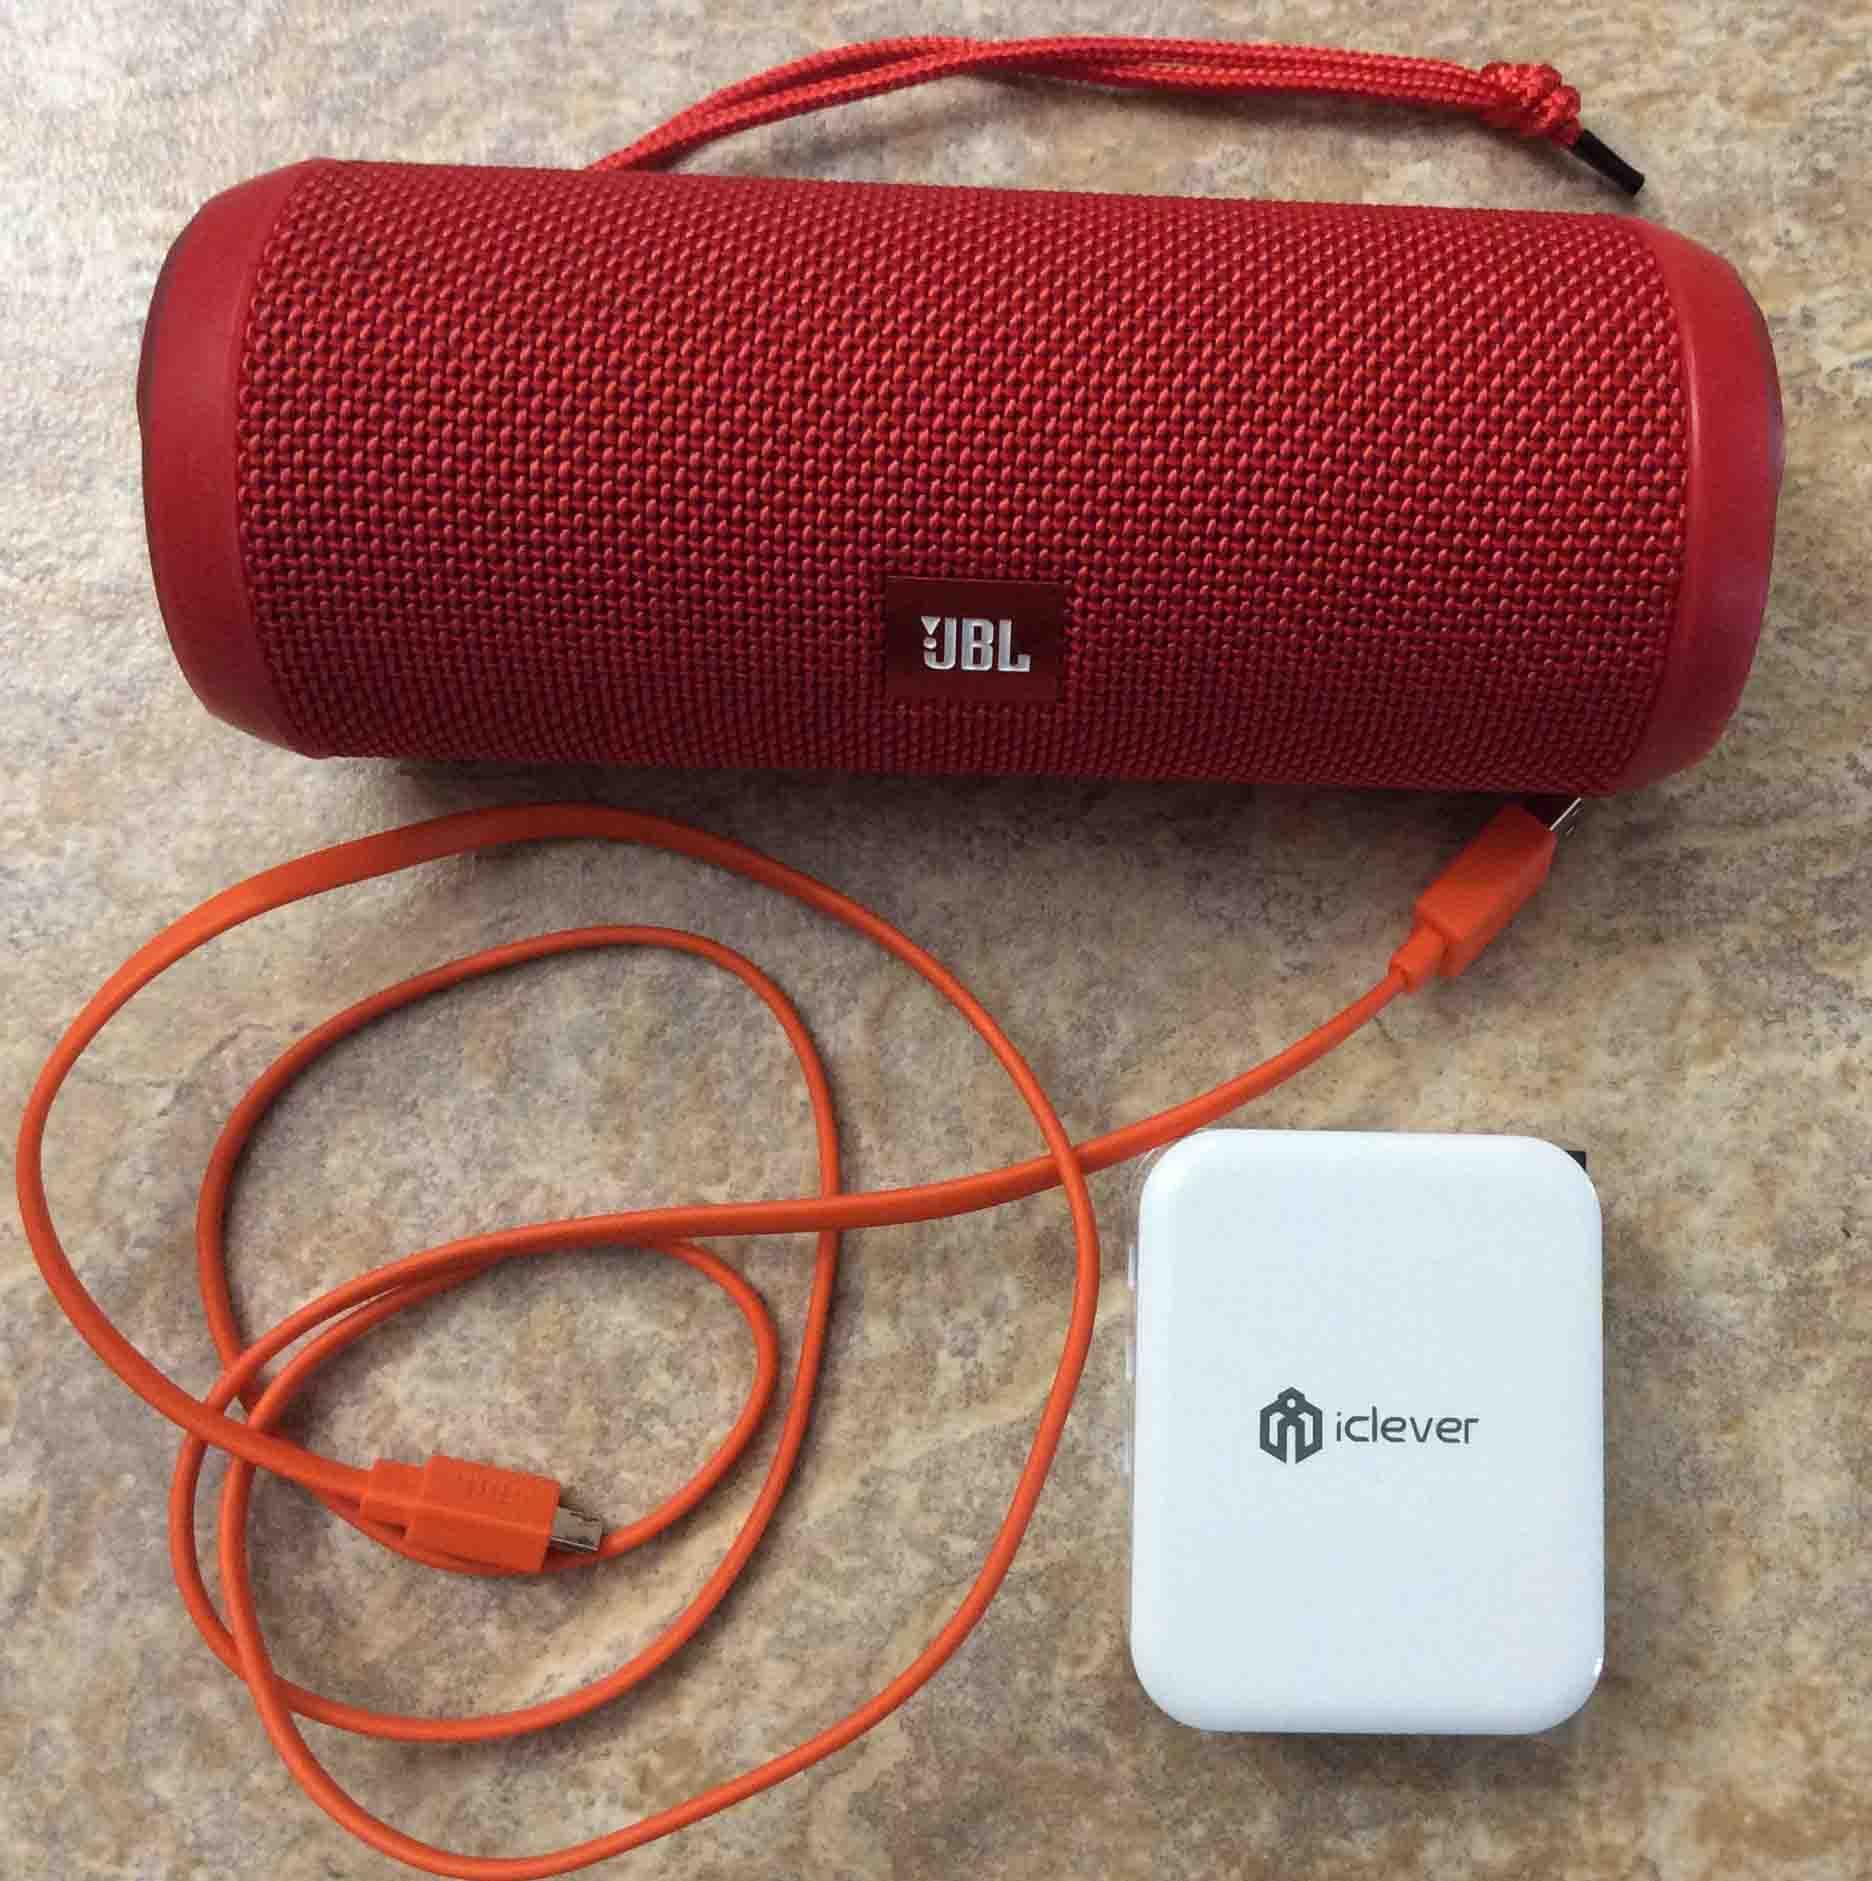 How To Charge Jbl Flip 3 Splashproof Bluetooth Speaker Battery Iii Pink